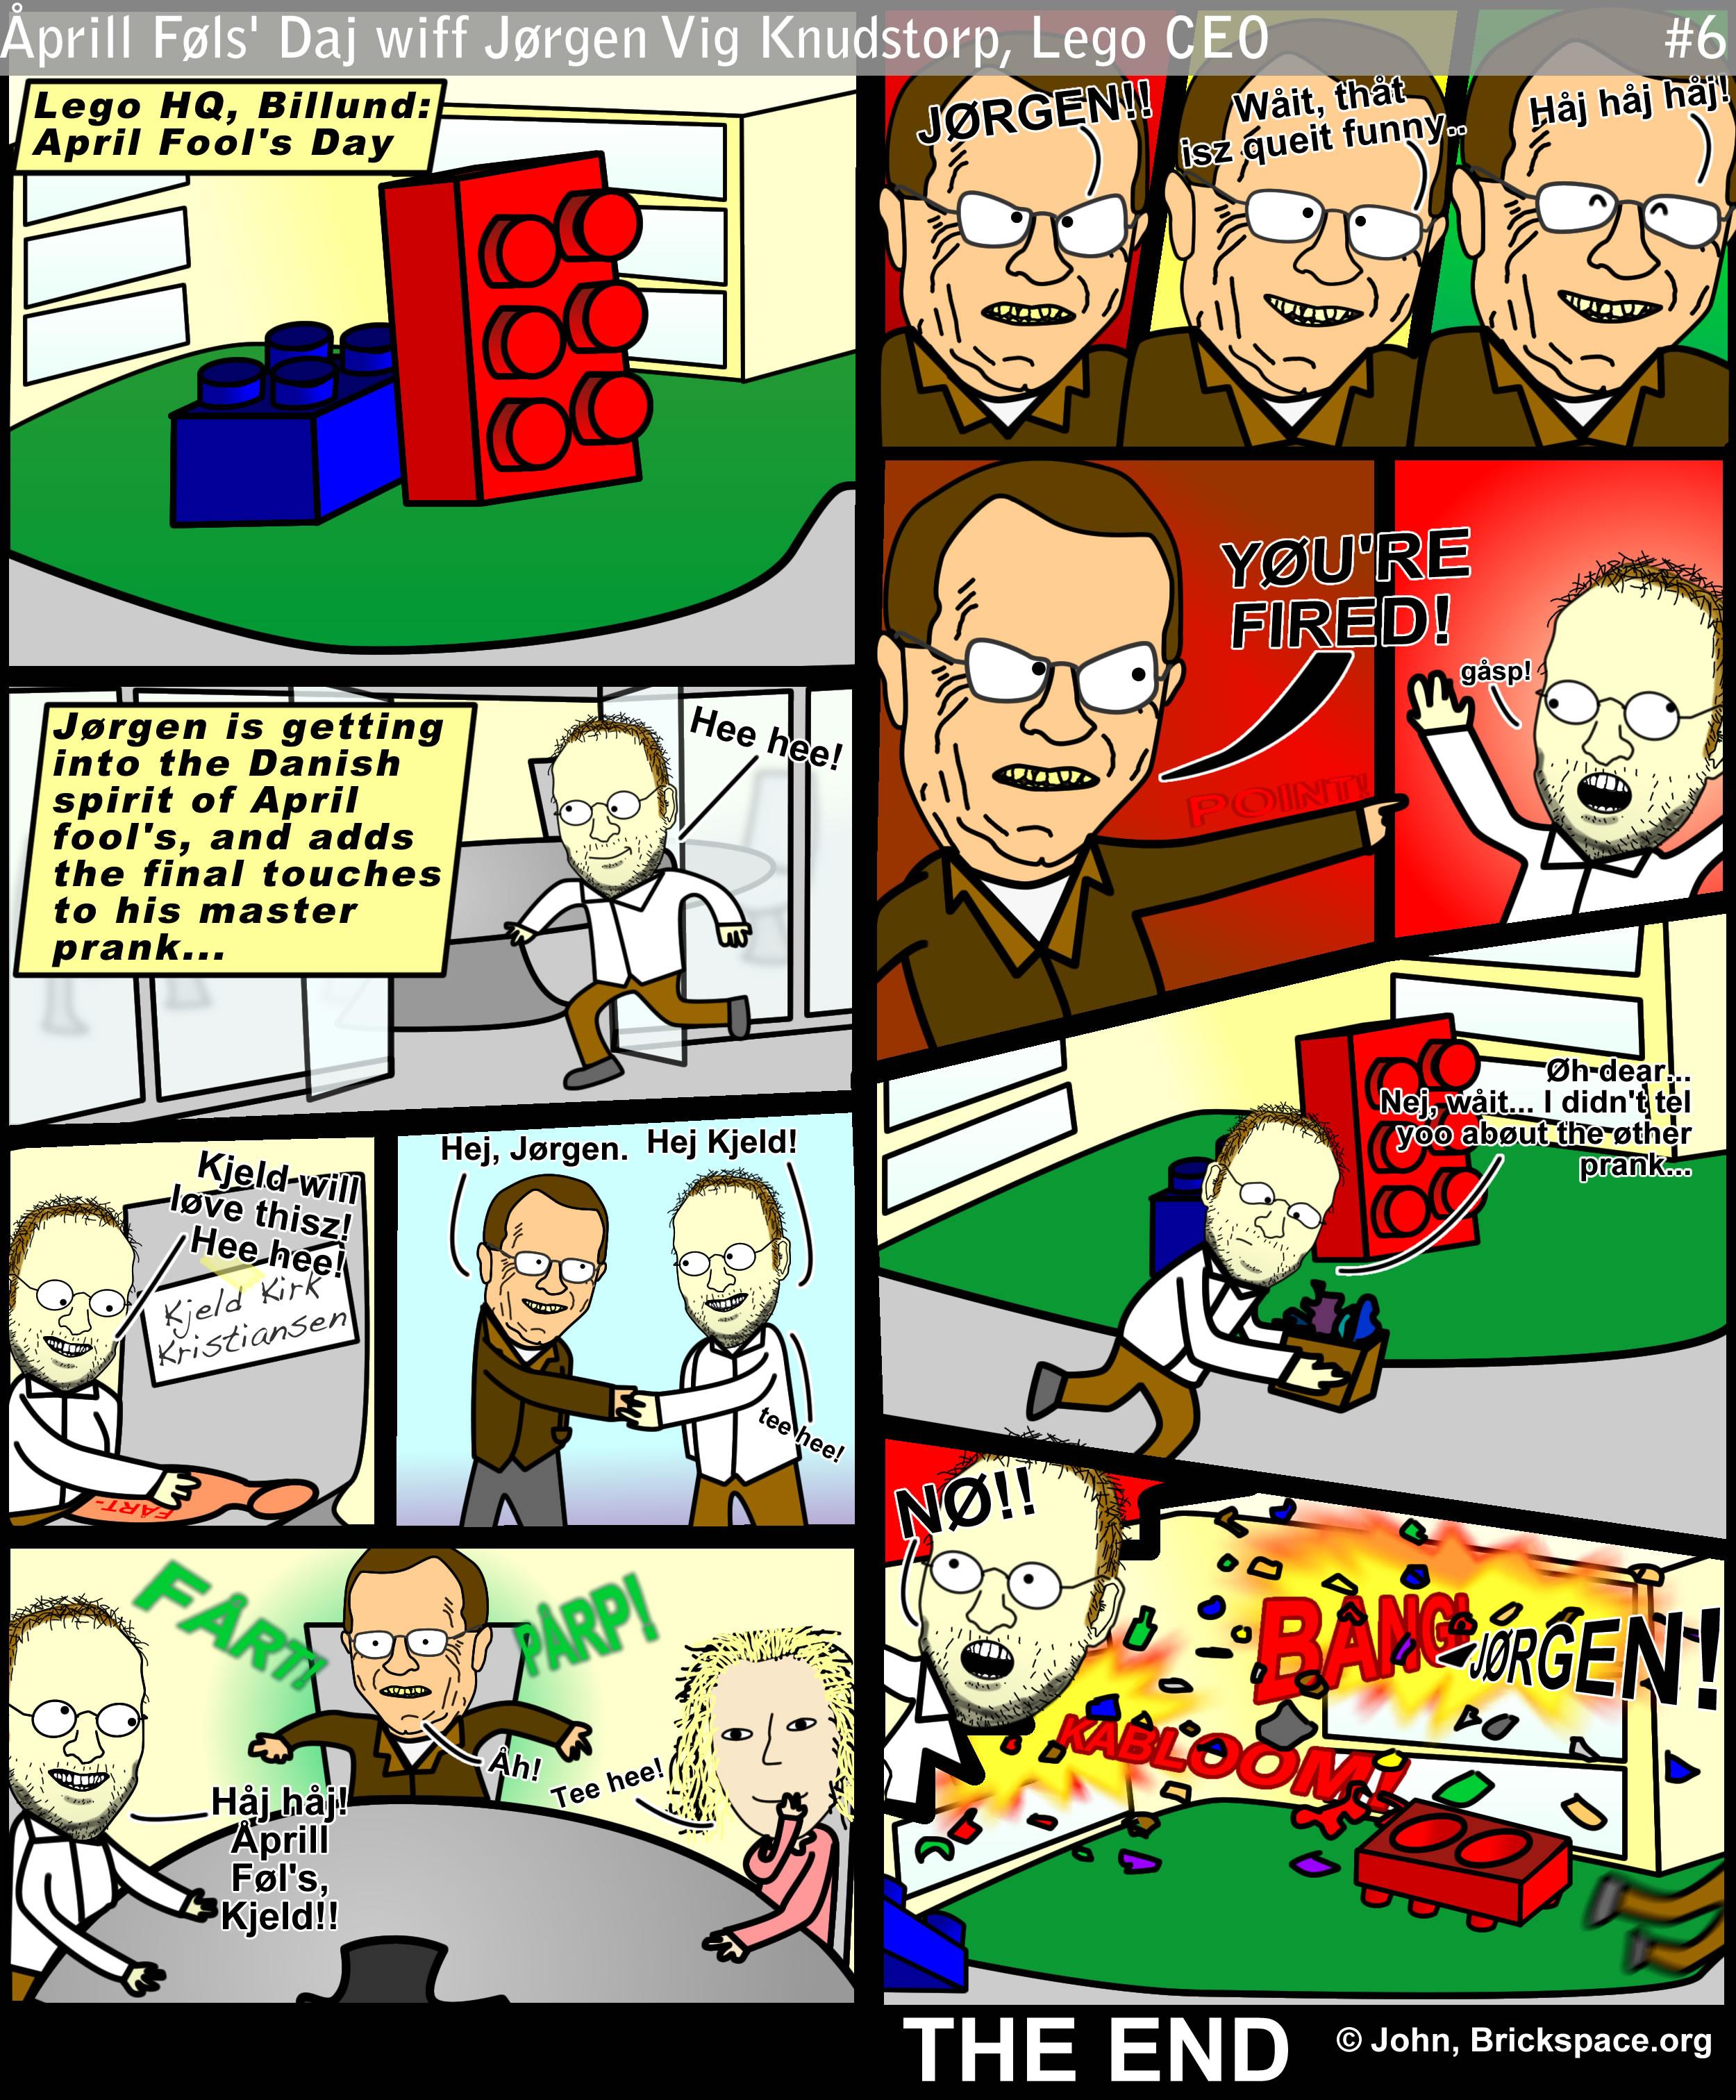 jvk_cartoon6